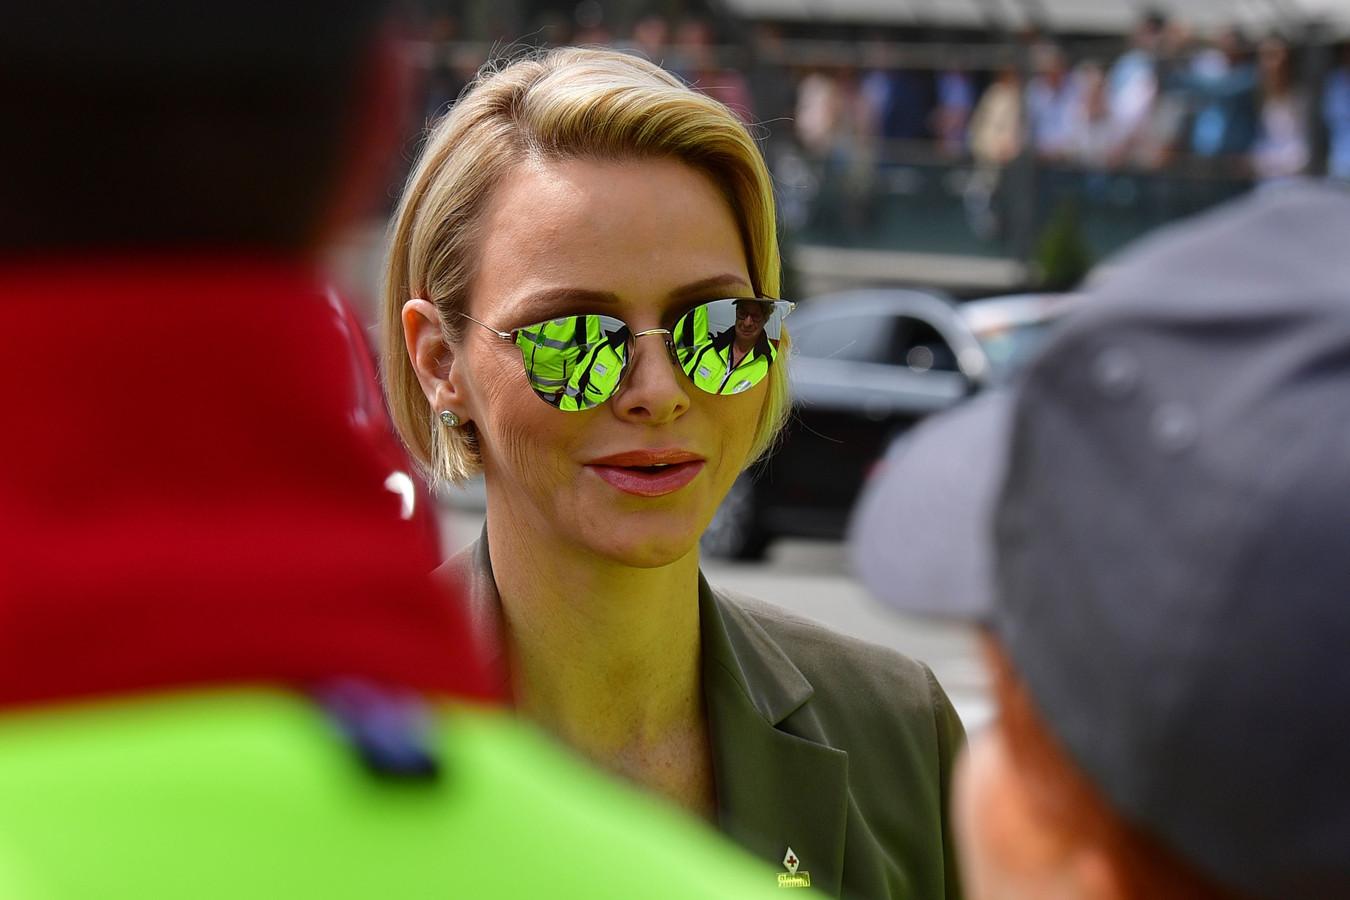 Charlene of Monaco aux essais du Grand Prix le 25 mai à Monte Carlo